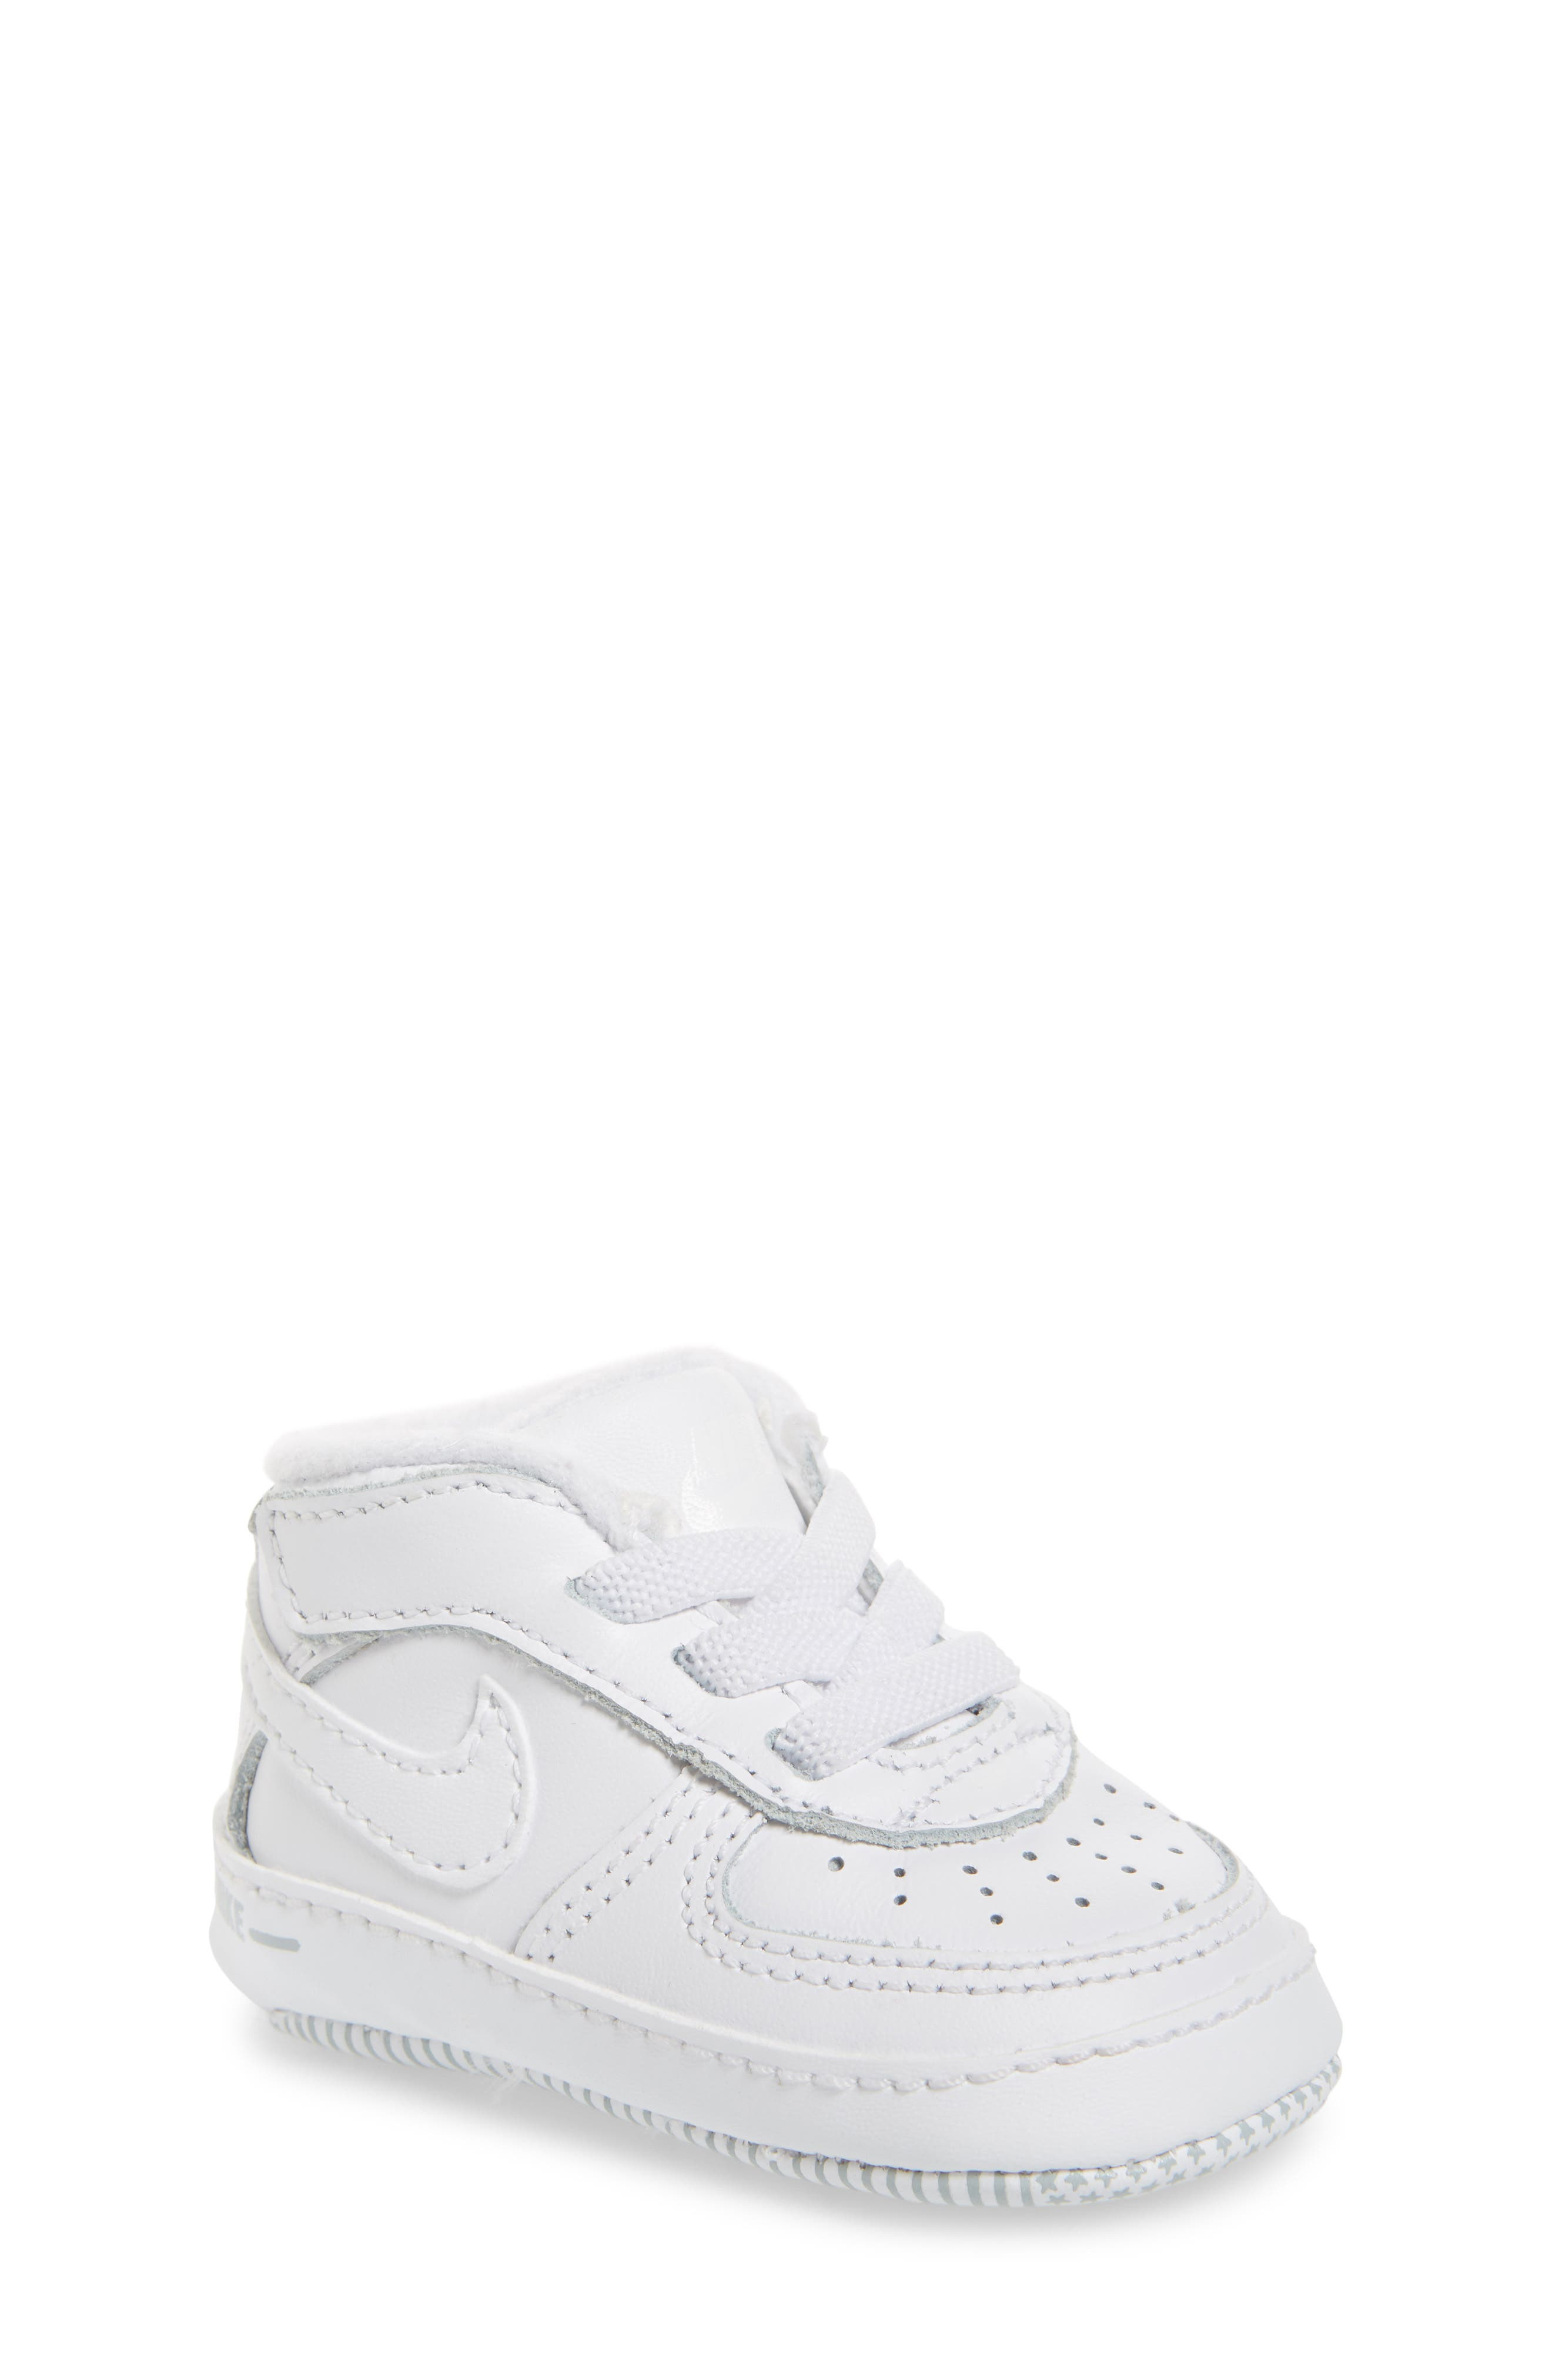 NIKE,                             Air Force 1 Sneaker,                             Main thumbnail 1, color,                             WHITE/ WHITE/ WHITE